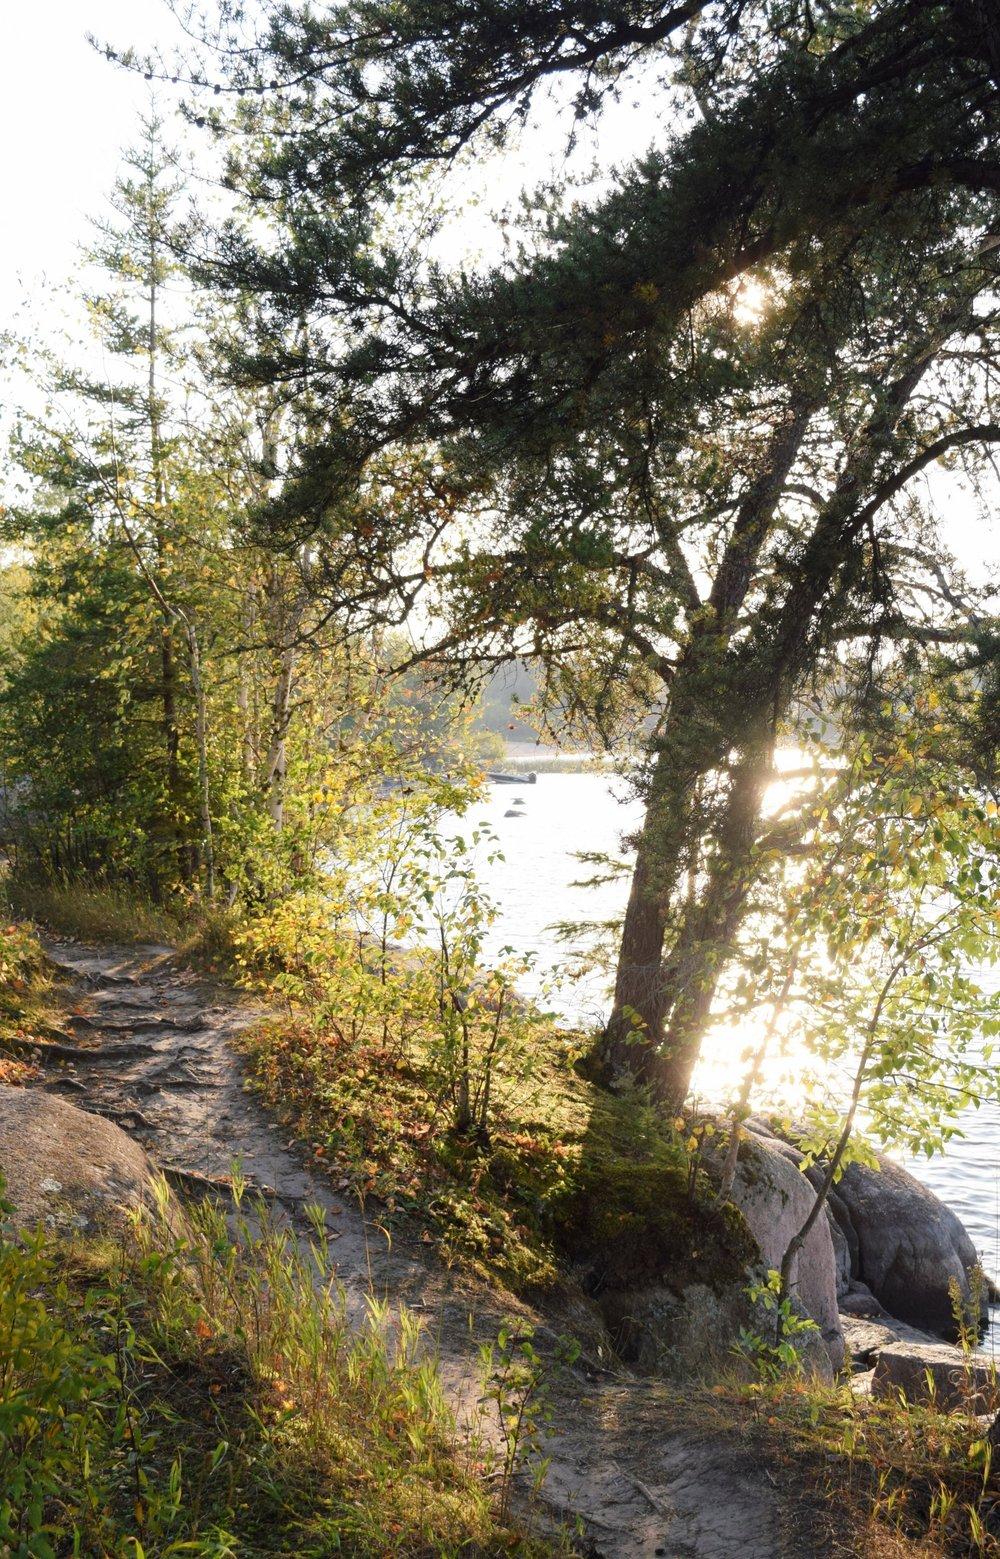 nutimik lake view through trees at golden hour